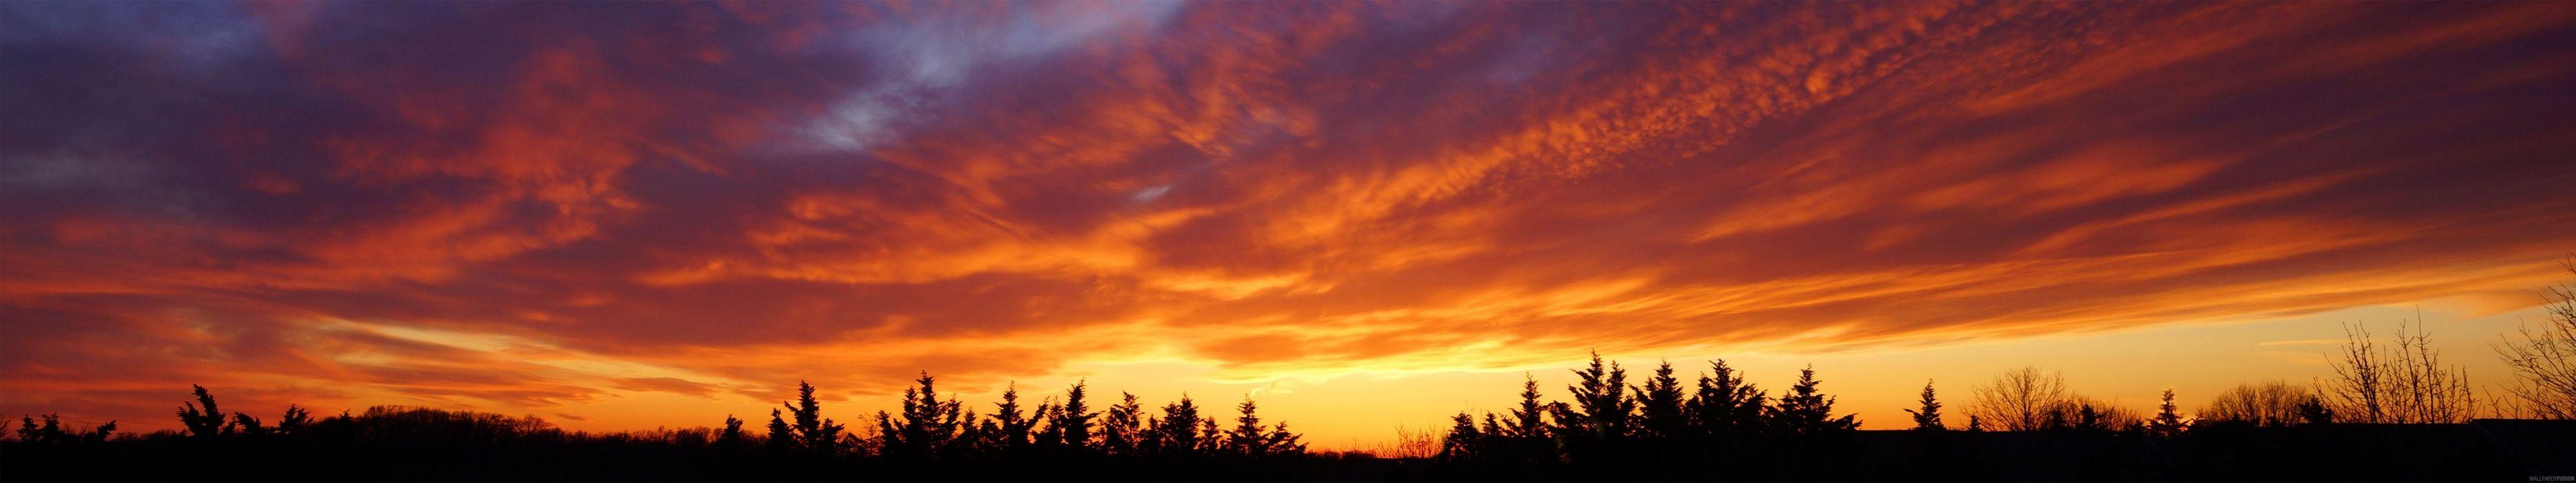 triple monitor multi screen multiple sunset sunrisem coucher lever de soleil wallpaper